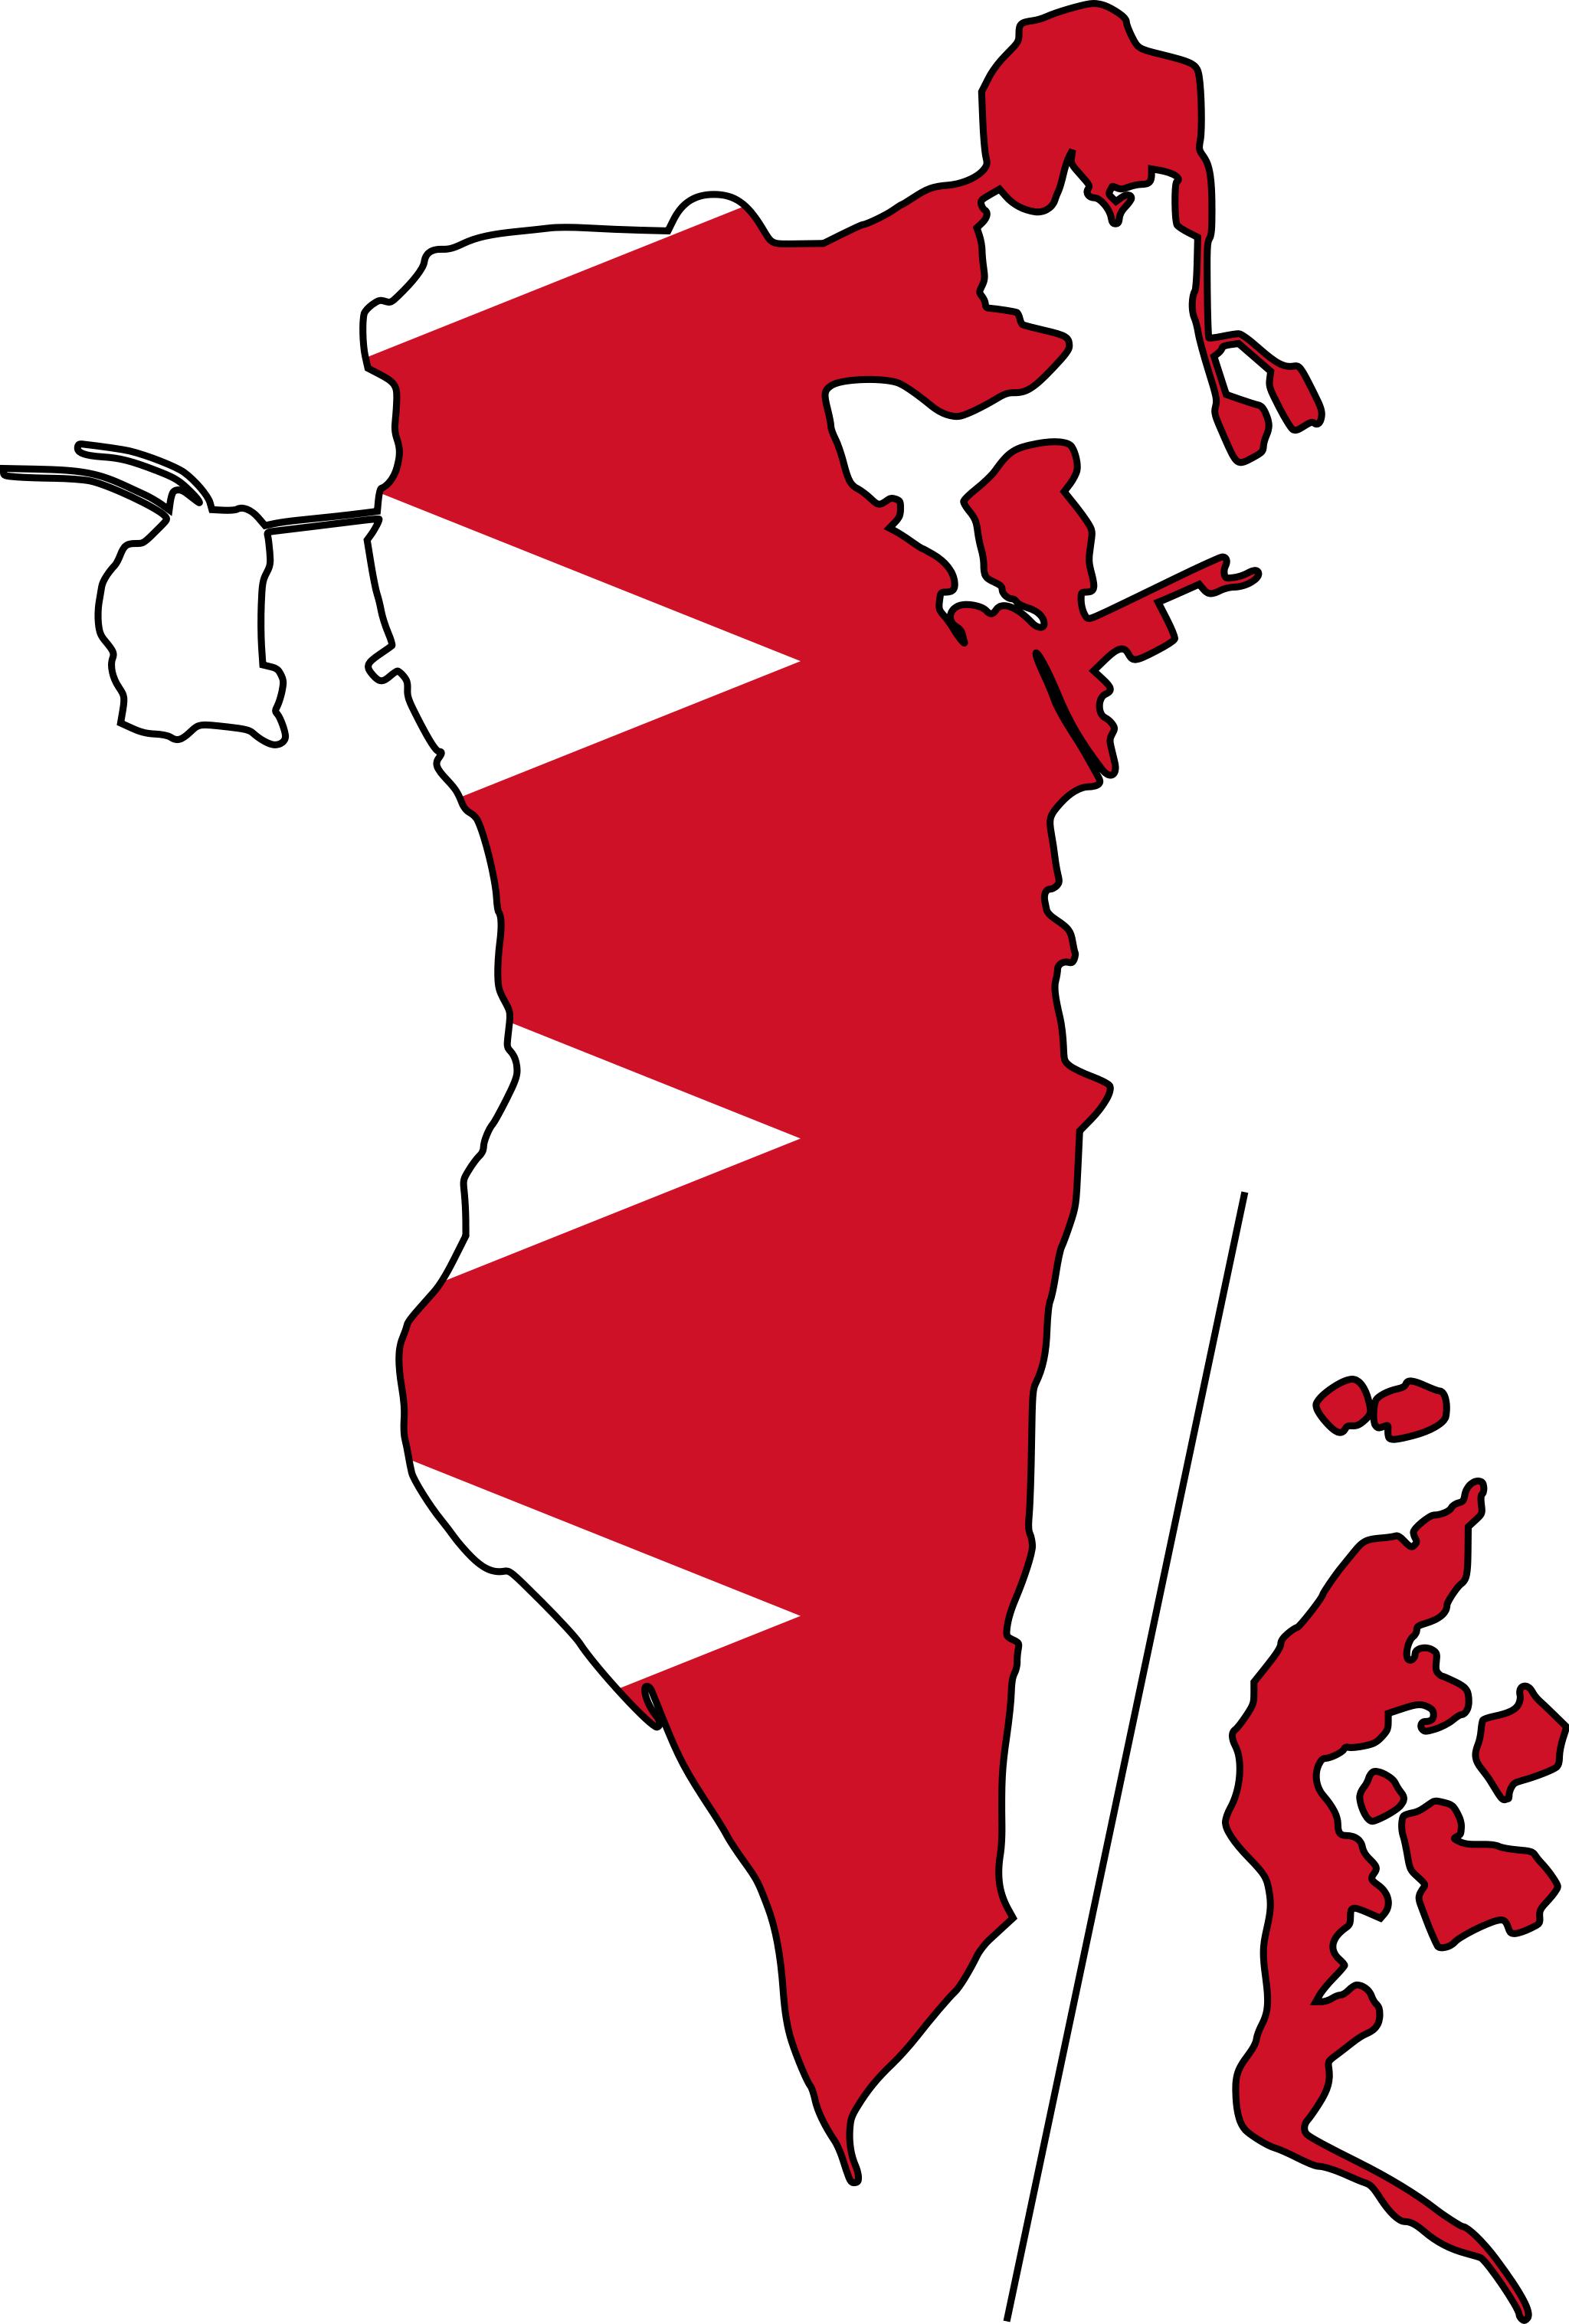 Bahrain map mapsof net. Missions clipart international flag